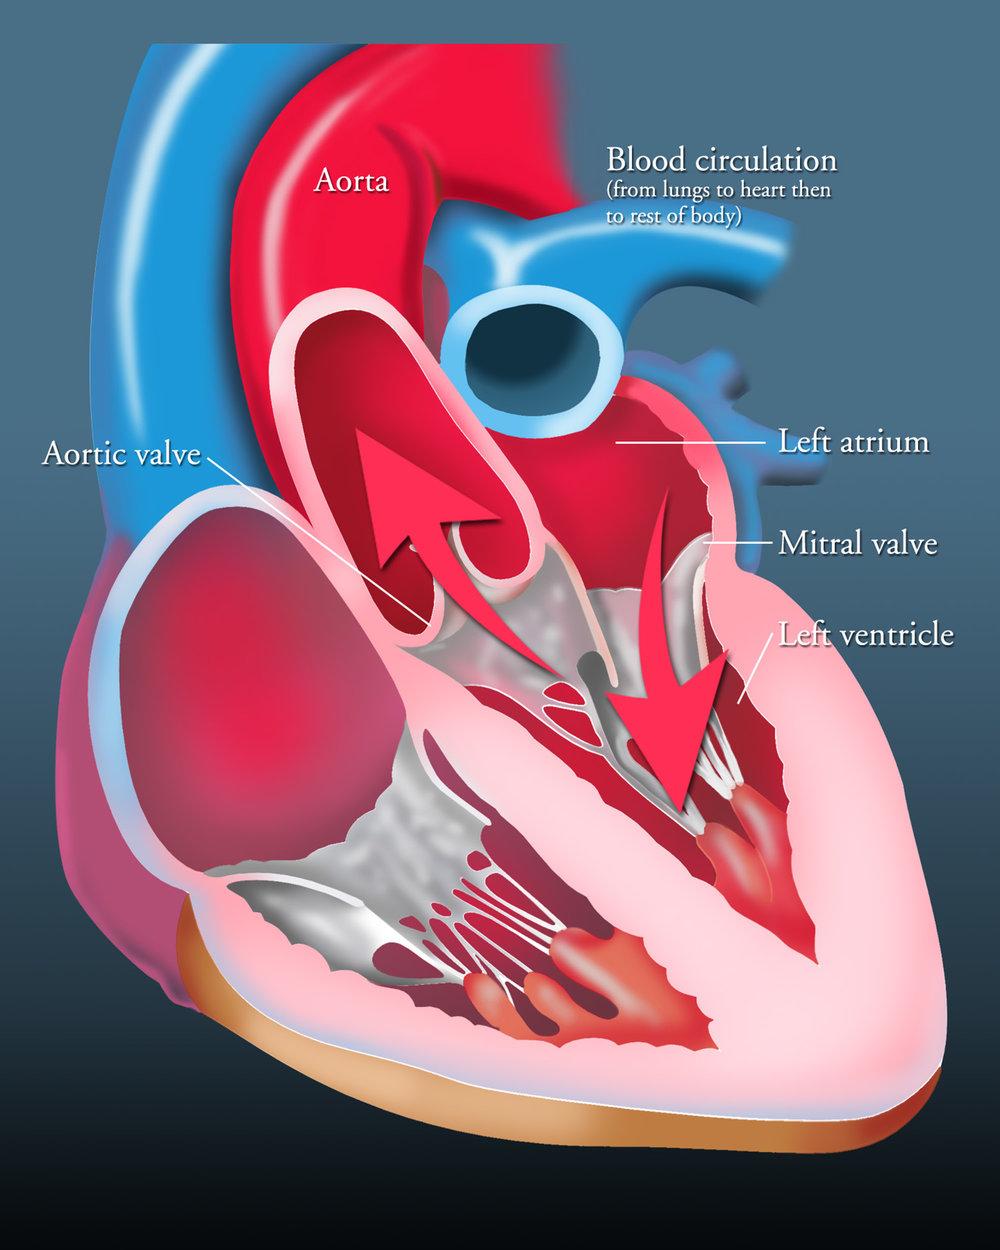 hearthrtcirc1500.jpg